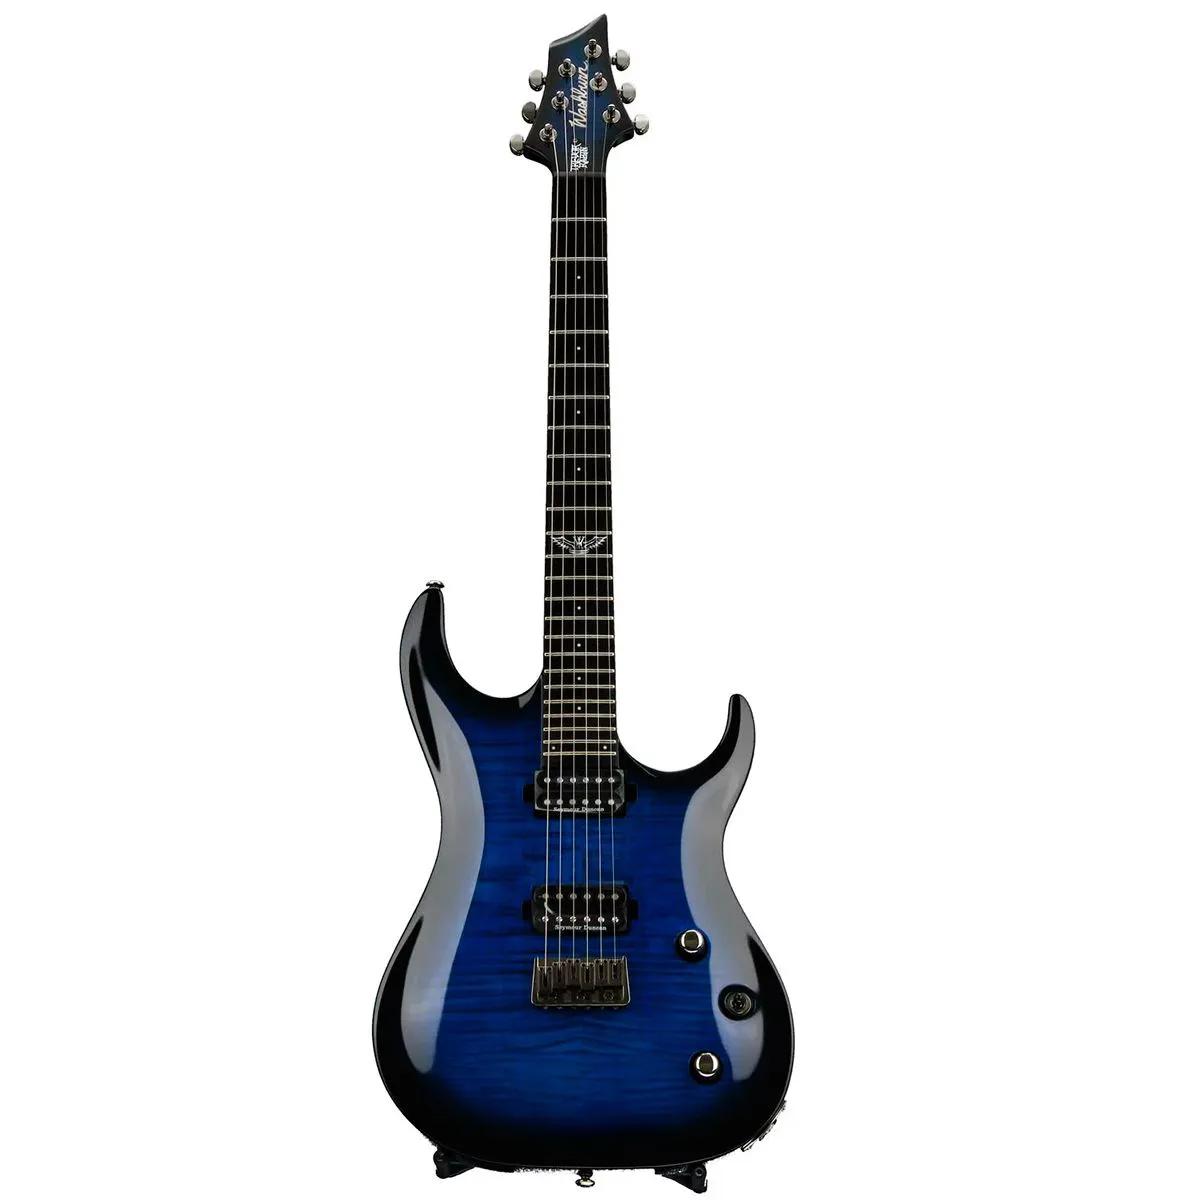 Guitarra Washburn Parallaxe PXMTR20 Trevor Rabin Signature